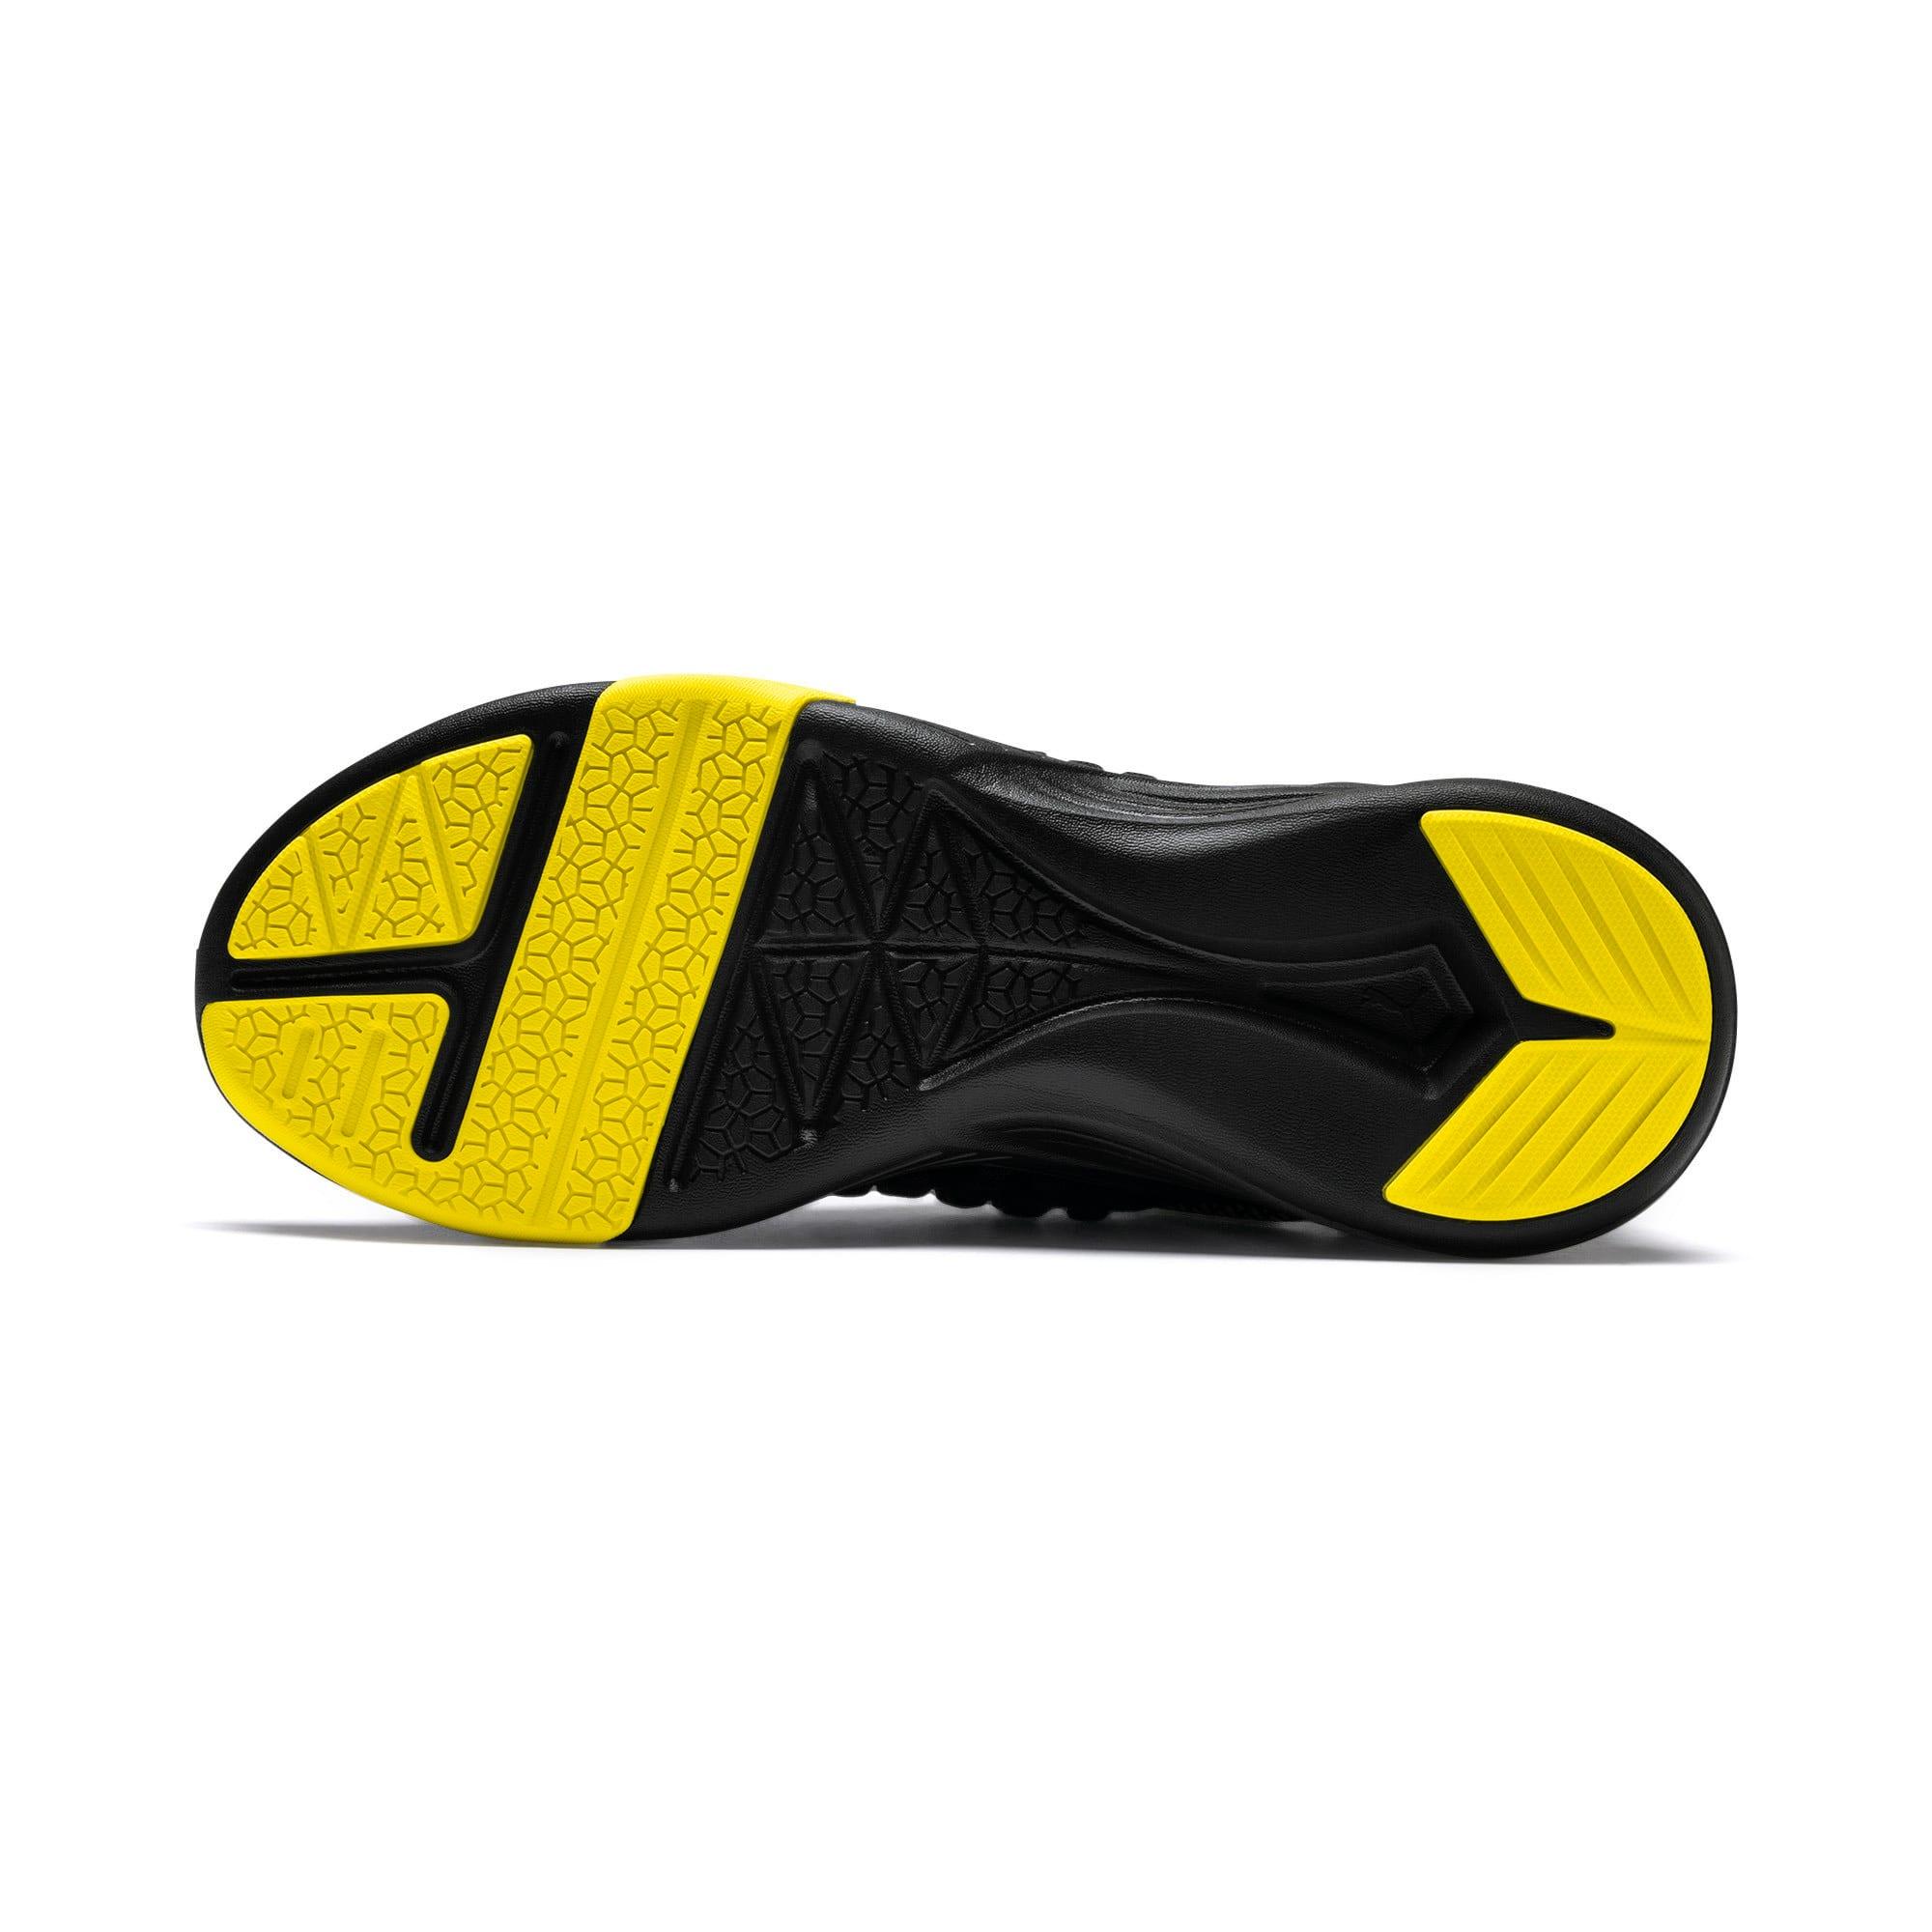 Thumbnail 4 of Mantra Caution Herren Trainingsschuhe, Puma Black-Blazing Yellow, medium